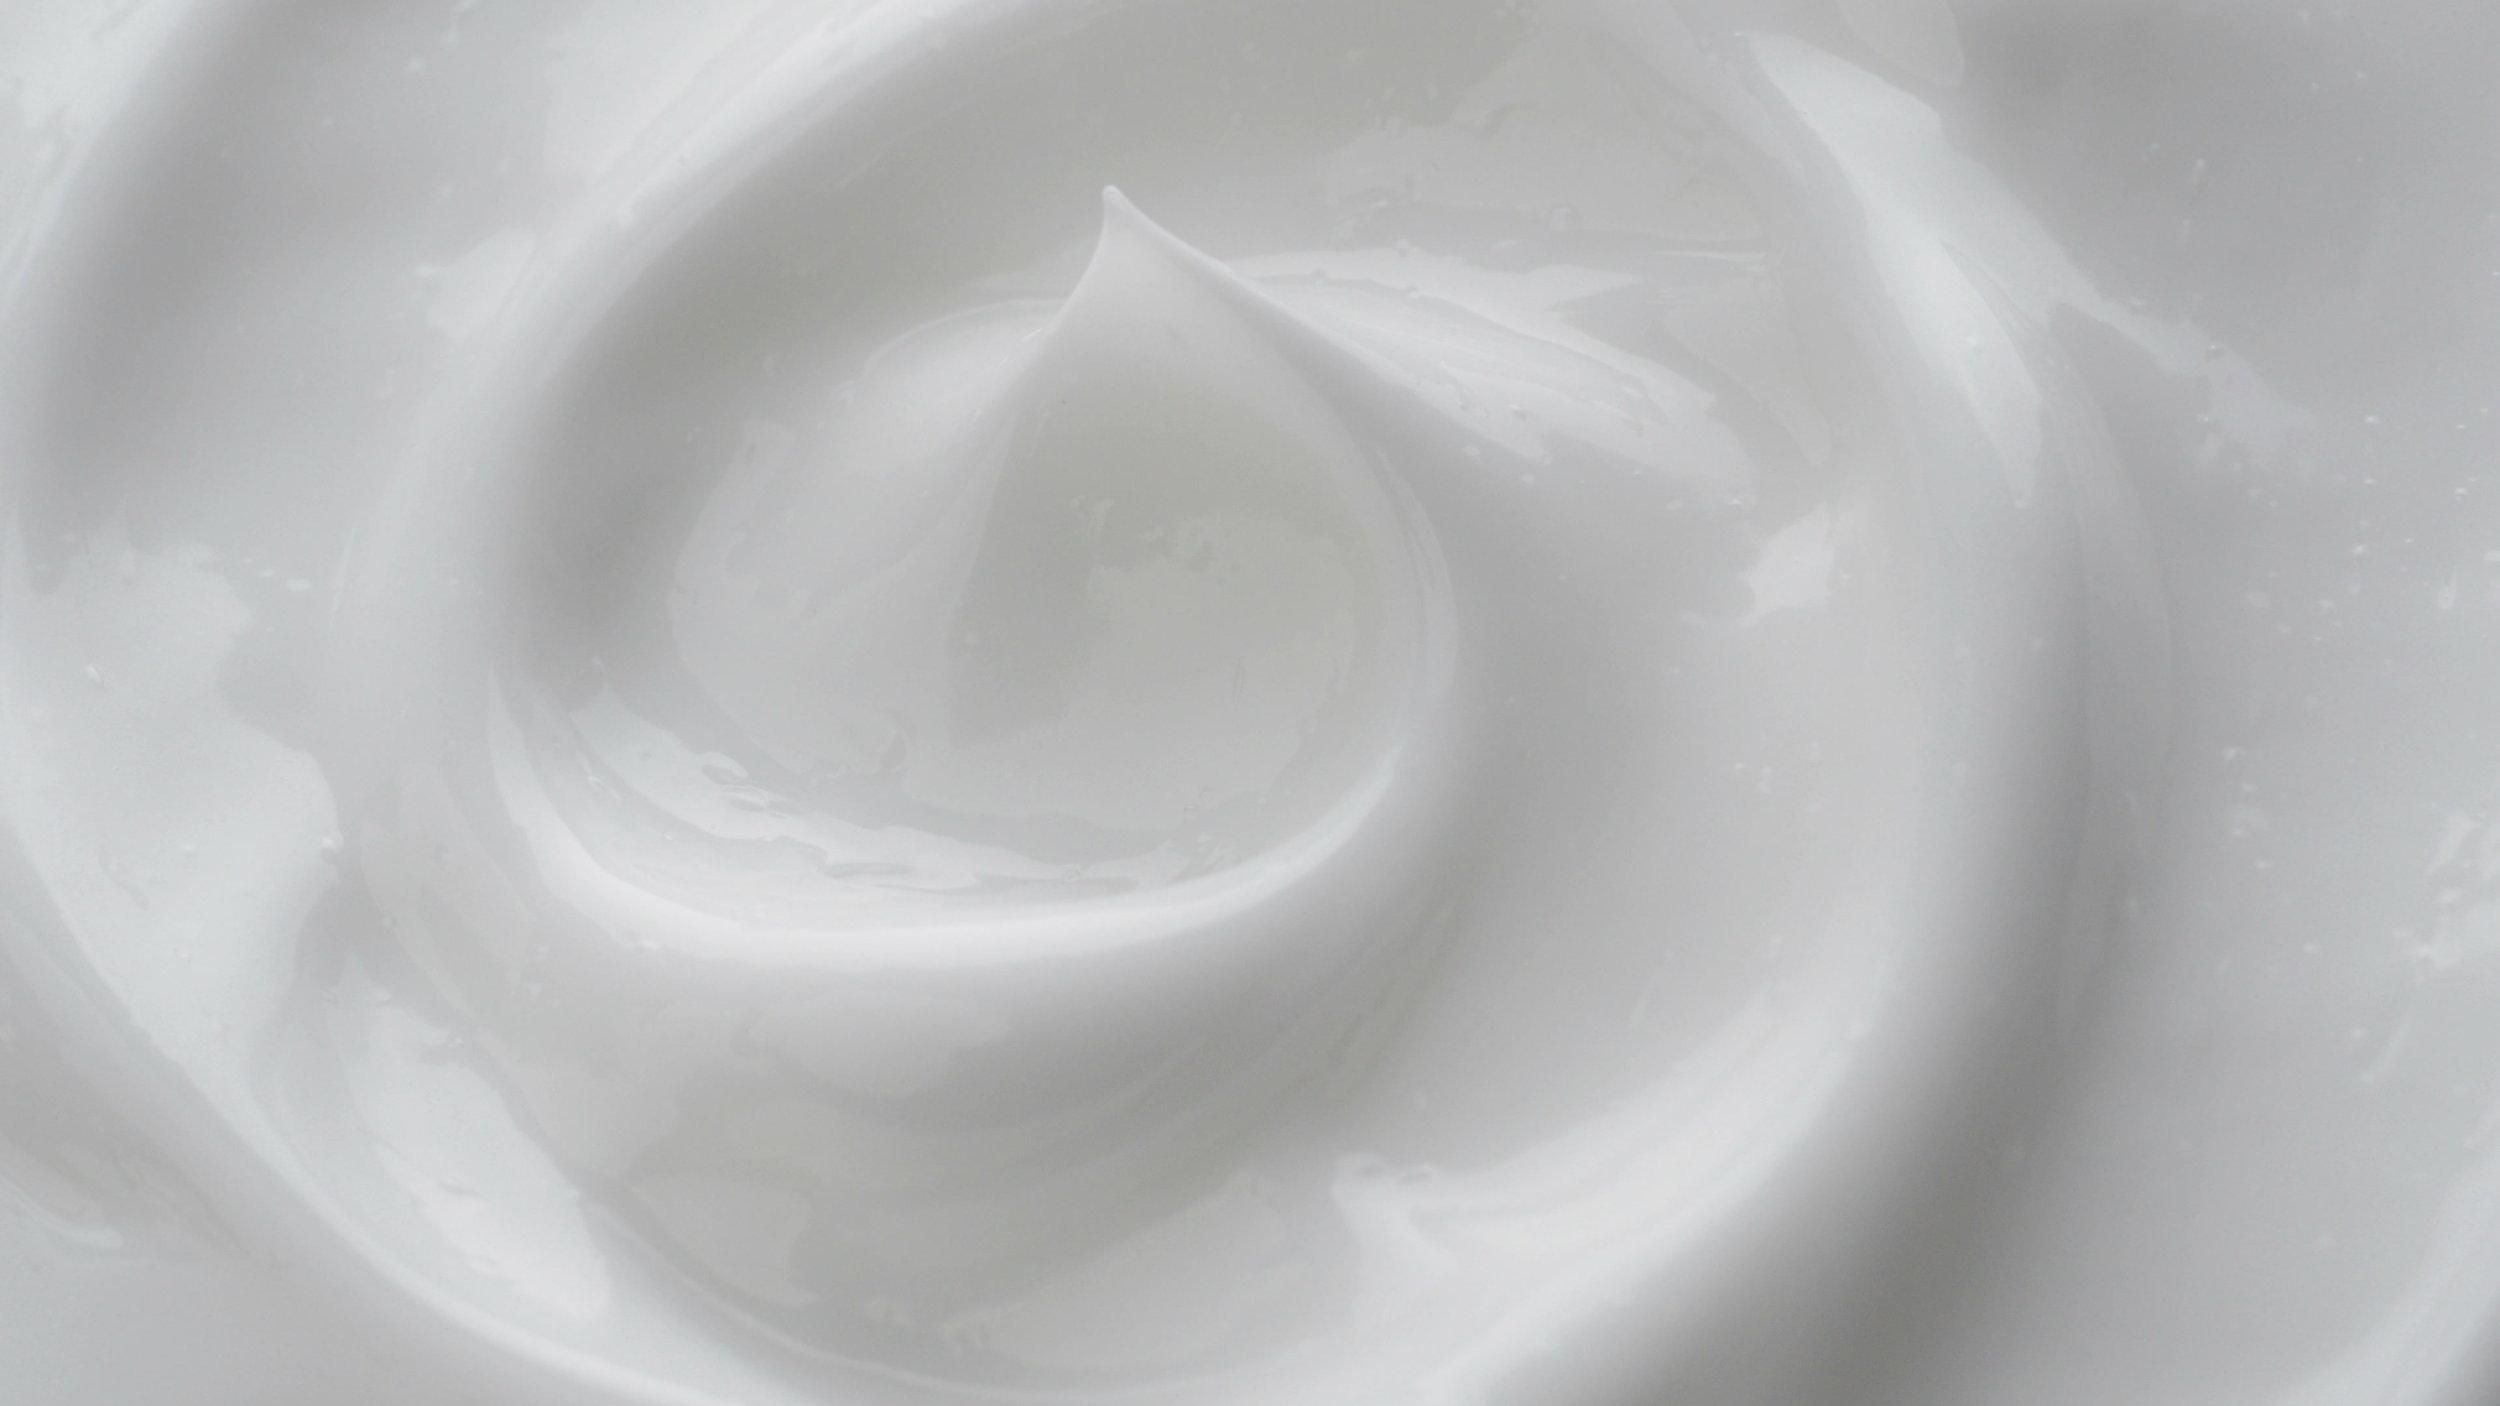 white-gentle-cosmetic-cream-footage-073769076_prevstill.jpeg